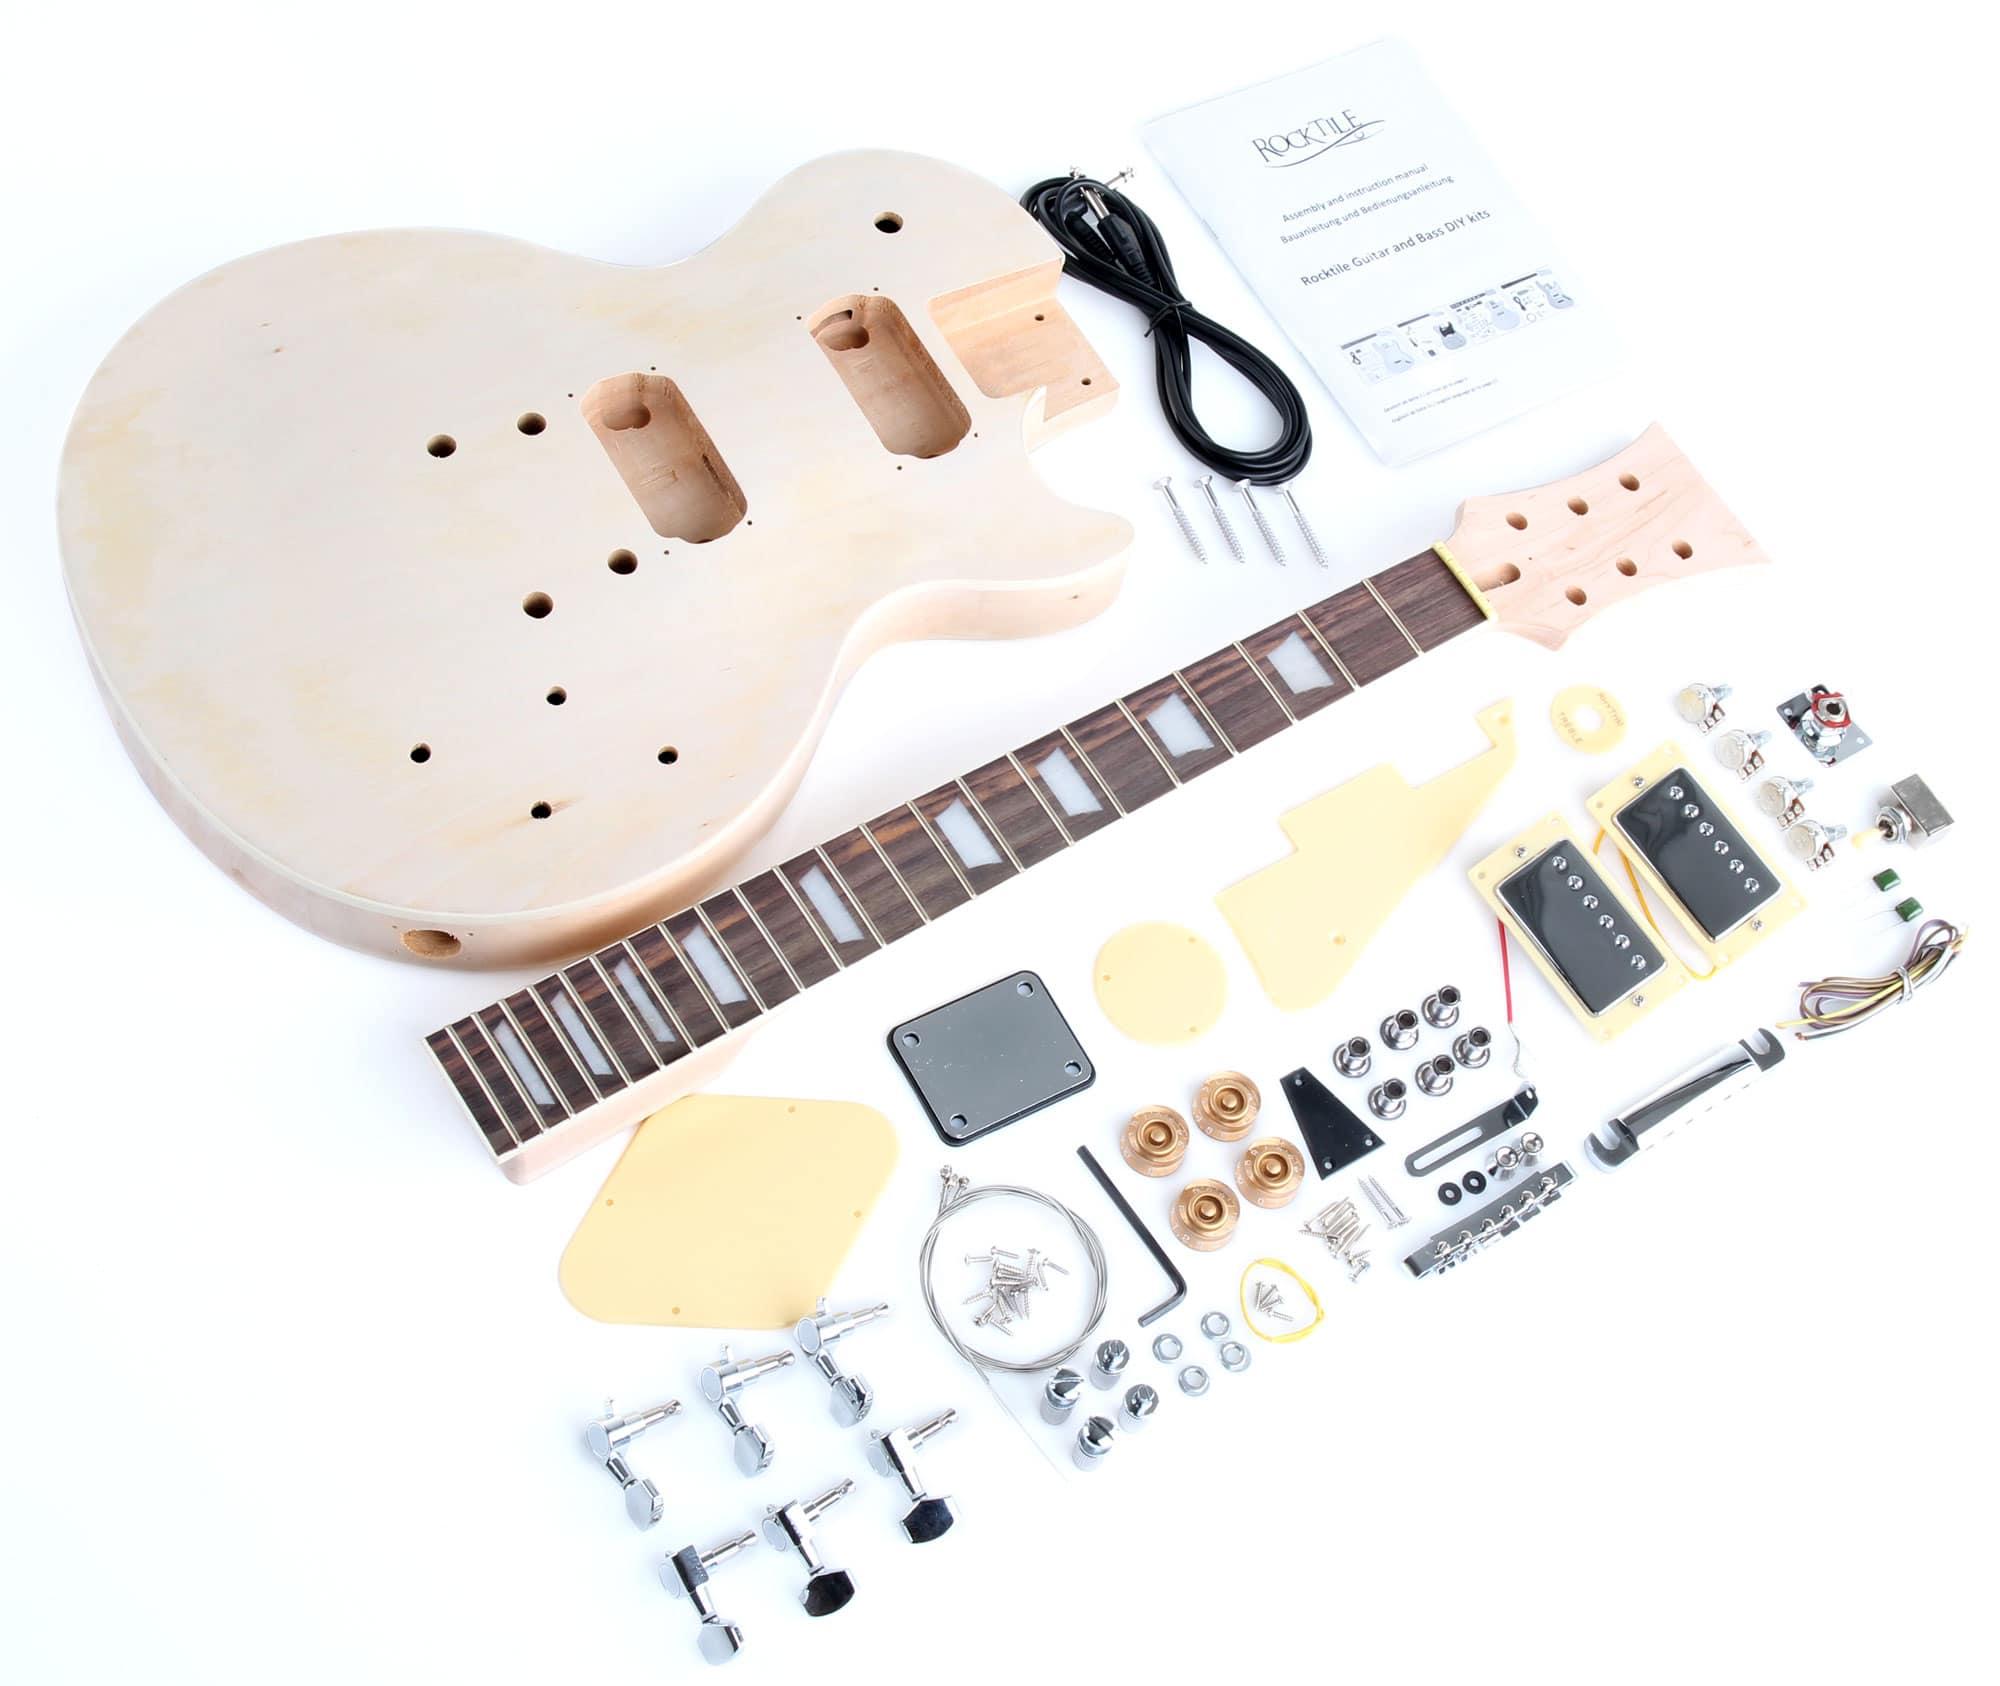 Schön E Gitarren Schema Fotos - Schaltplan Serie Circuit Collection ...